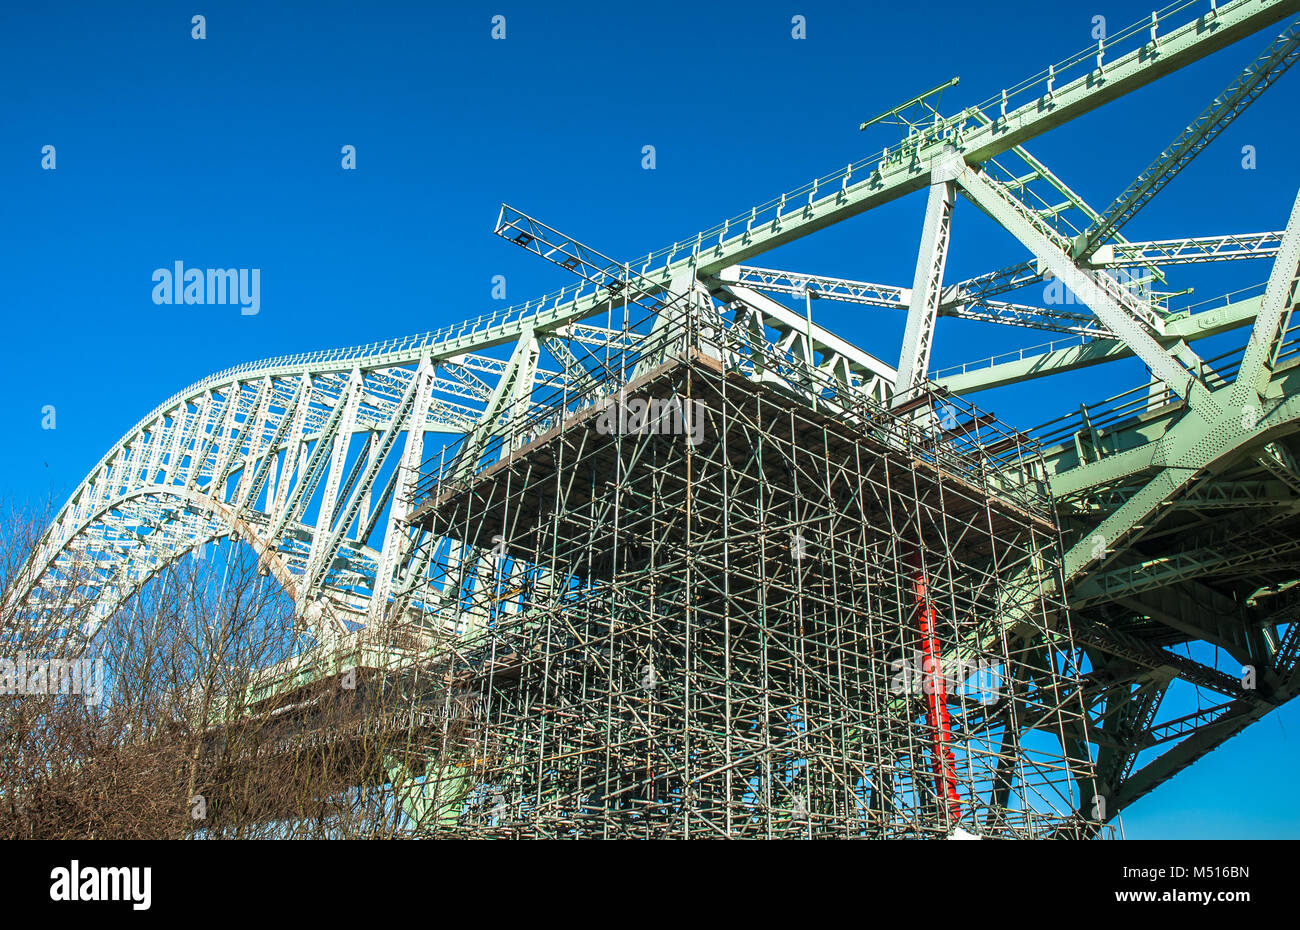 "Silver Jubilee Bridge, ""Runcorn-Widnes Bridge"" or Runcorn Bridge undergoing structural work in 2010, Cheshire, Uk. Stock Photo"